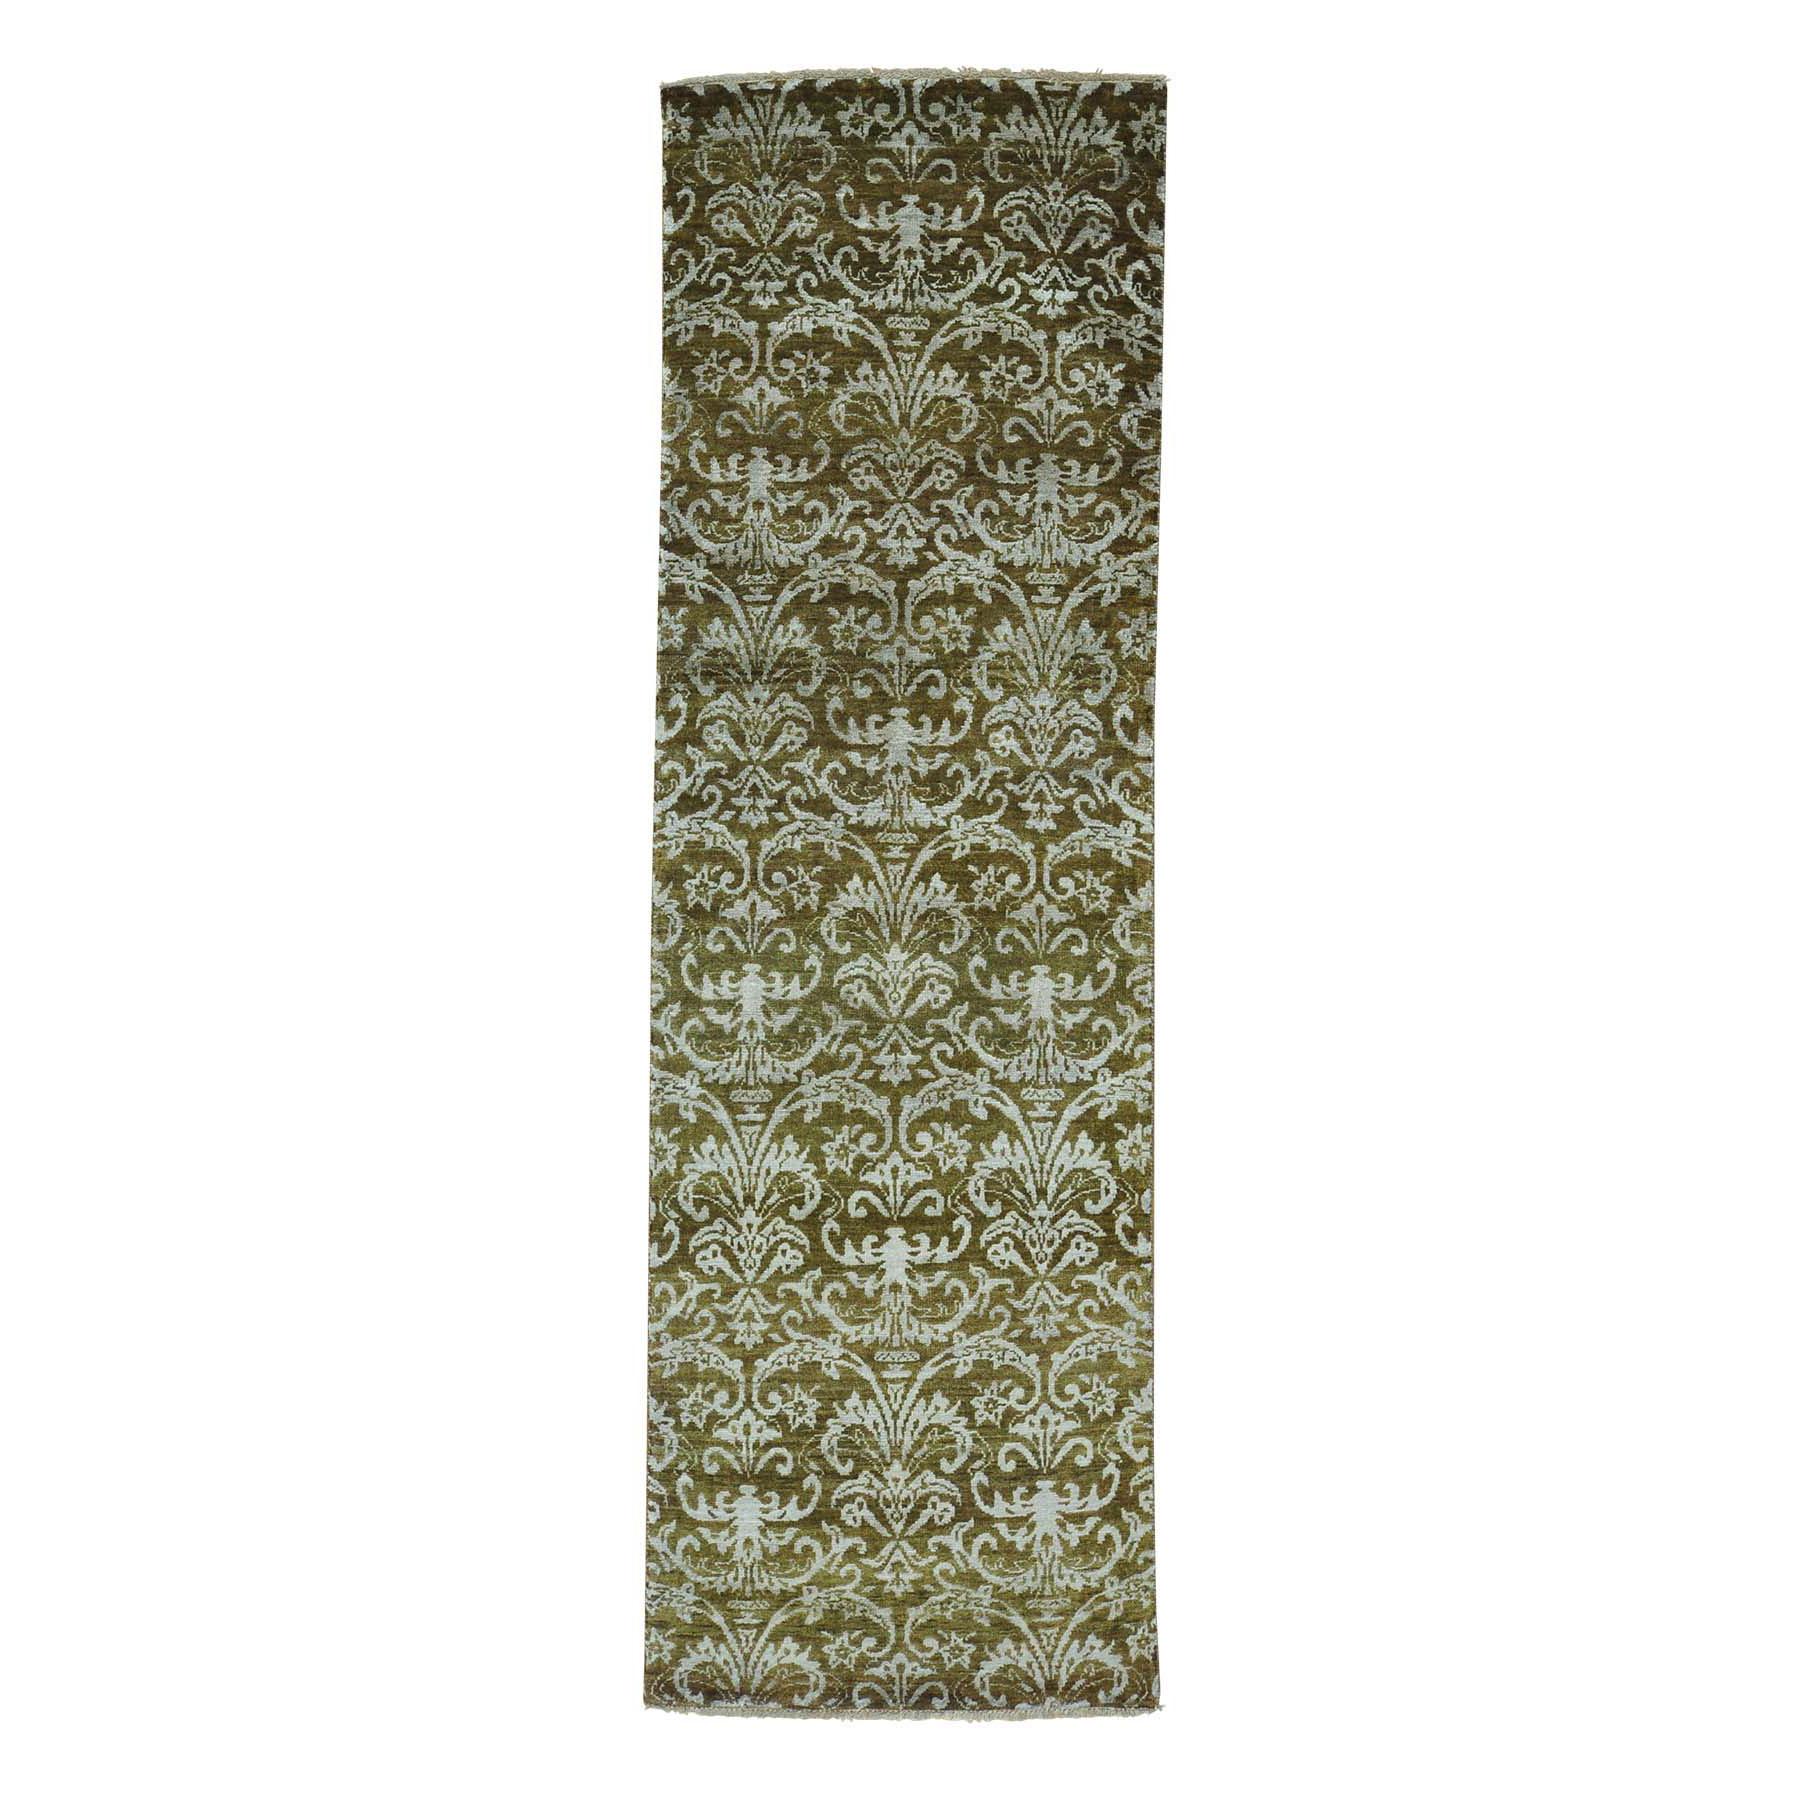 "2'4""X7'6"" Wool And Silk Tone On Tone Damask Runner Handmade Oriental Rug moab7ddc"